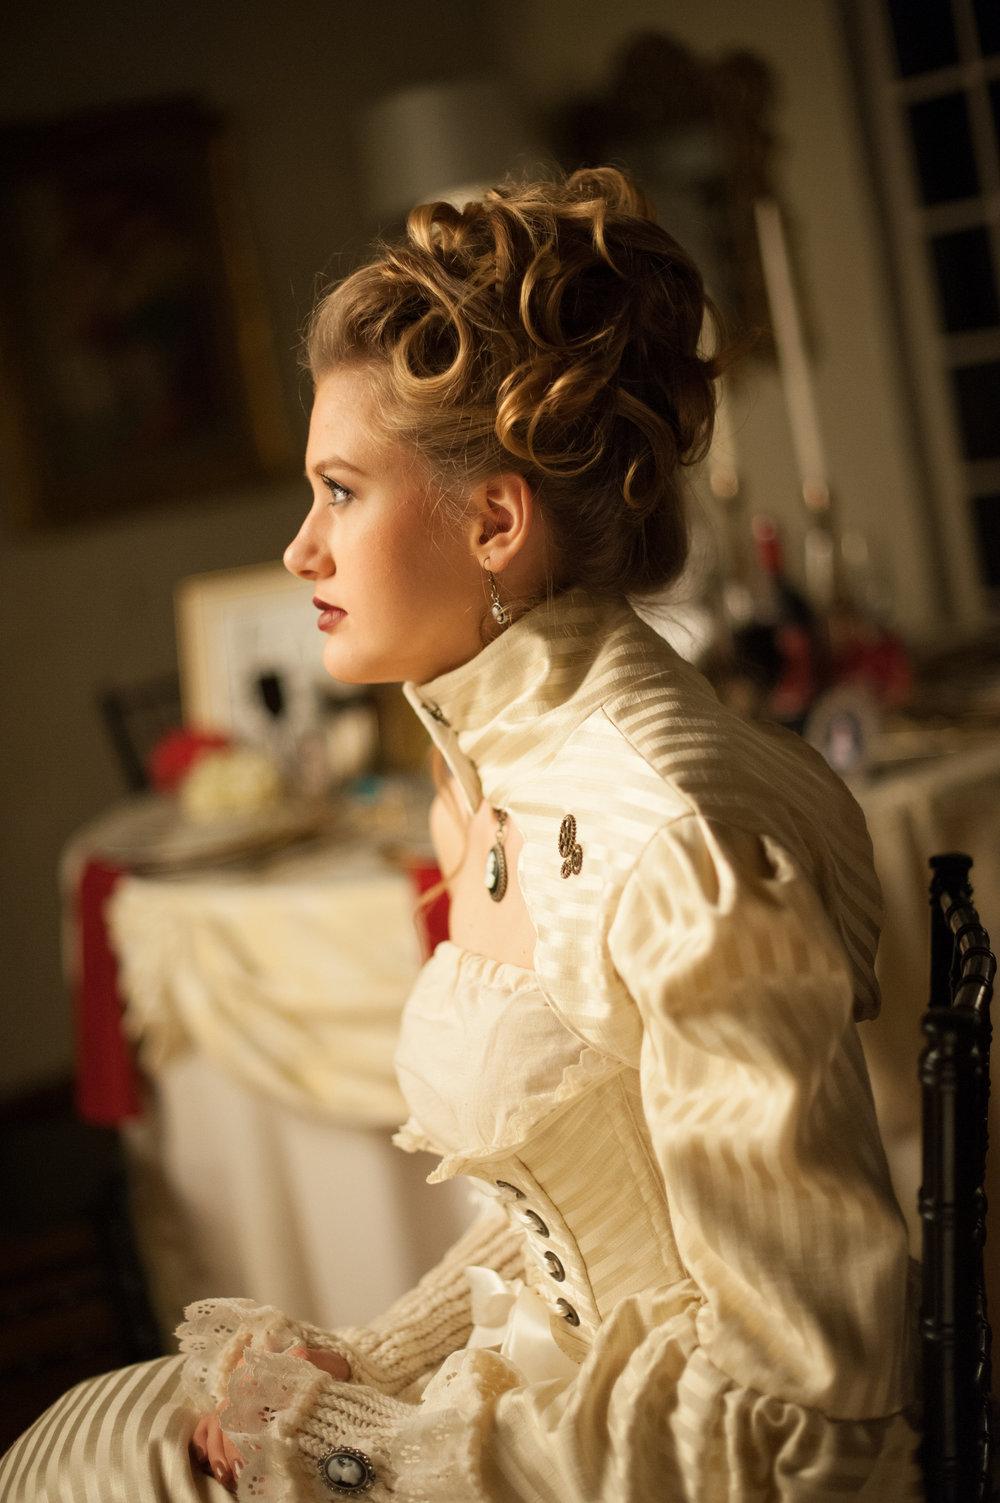 Marie Antoinette Unedited-Unedited JPGS-0102.jpg